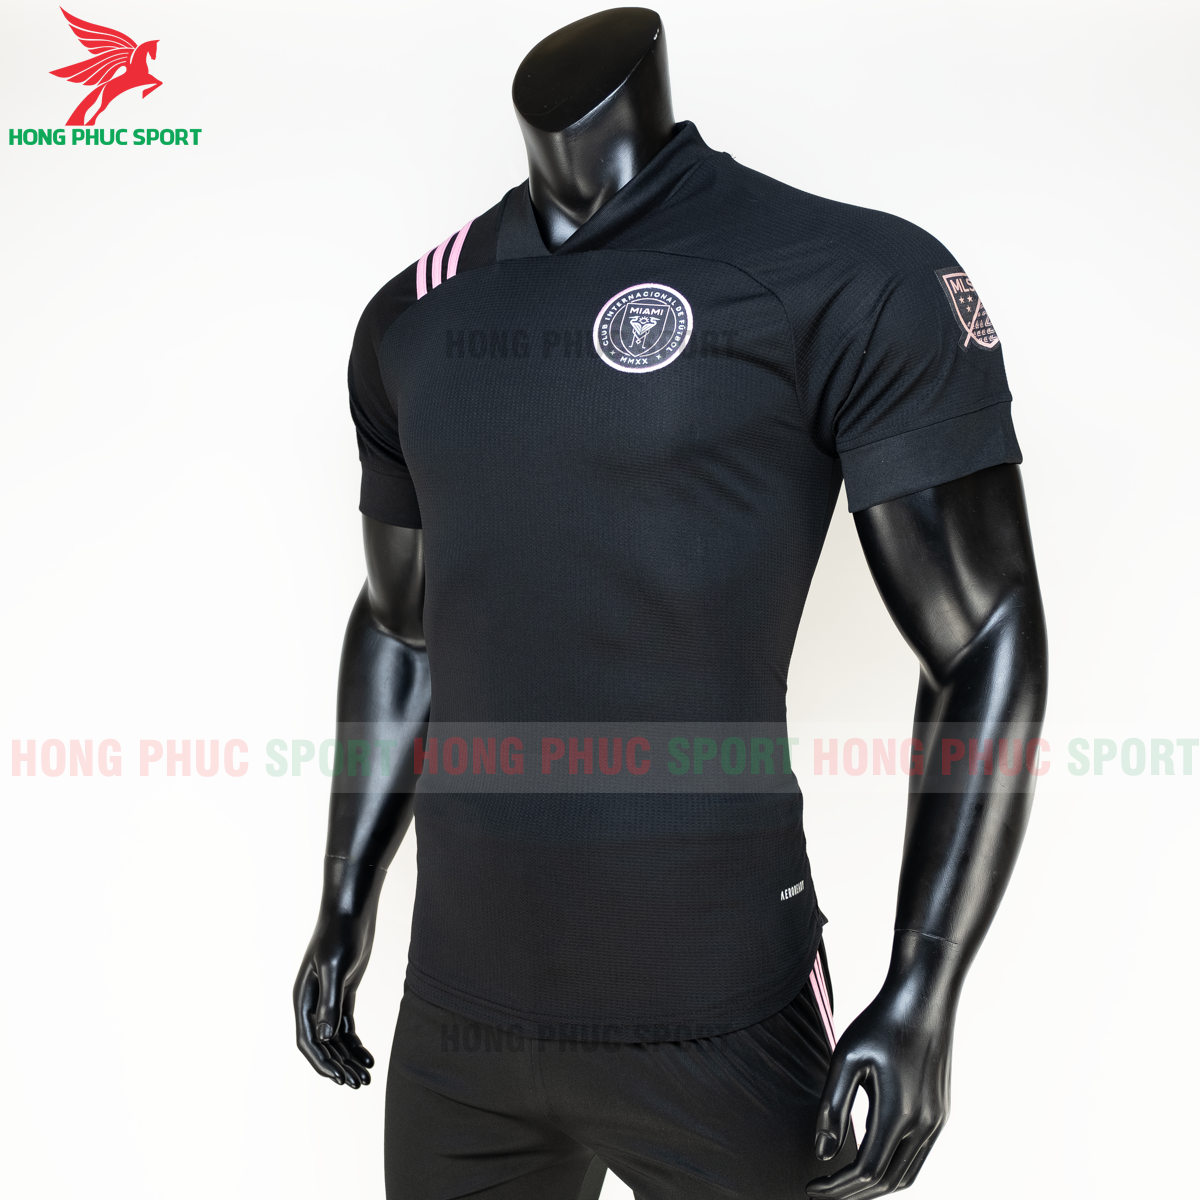 https://cdn.hongphucsport.com/unsafe/s4.shopbay.vn/files/285/ao-inter-miami-20-21-san-khach-hang-thailand-4-5fa0d29d2b584.png